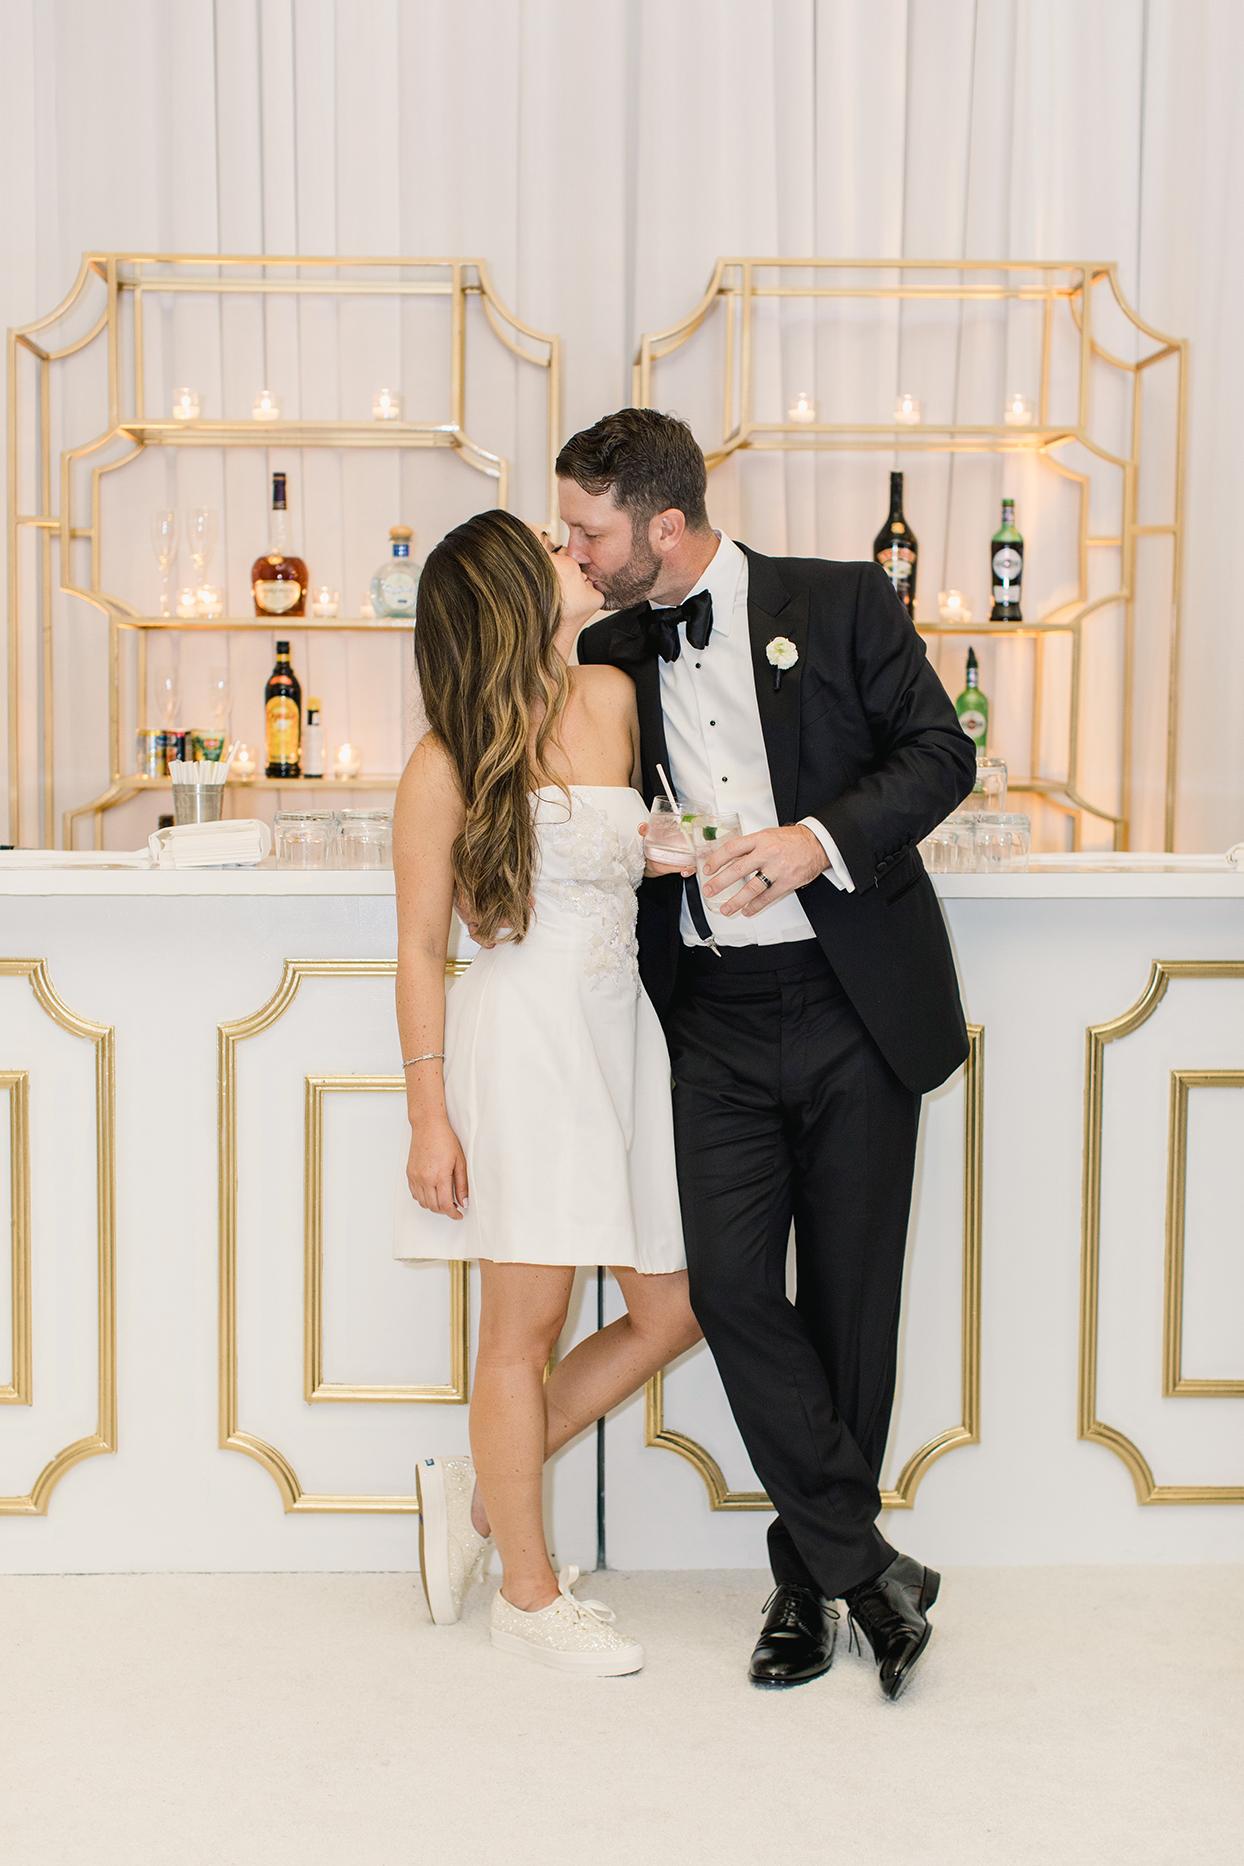 brittany brian wedding reception bride in short dress kissing groom at bar